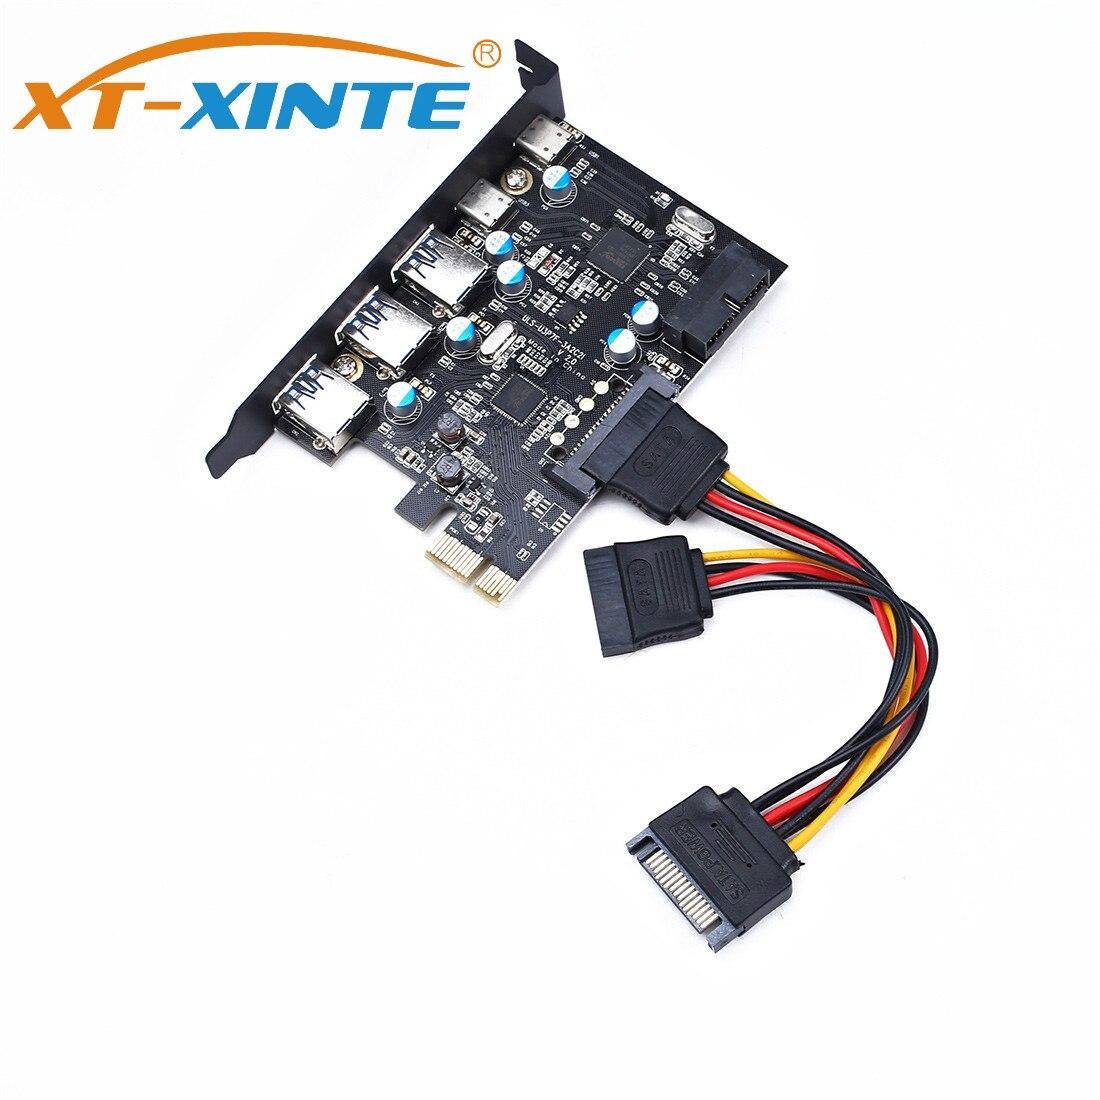 XT-XINTE USB 3.0 PCI-E Type C Expansion Card PCI Express Controller Adapter 3x UBS3.0 + 2x USB 3.1 + 4Pin Power 15Pin SATA